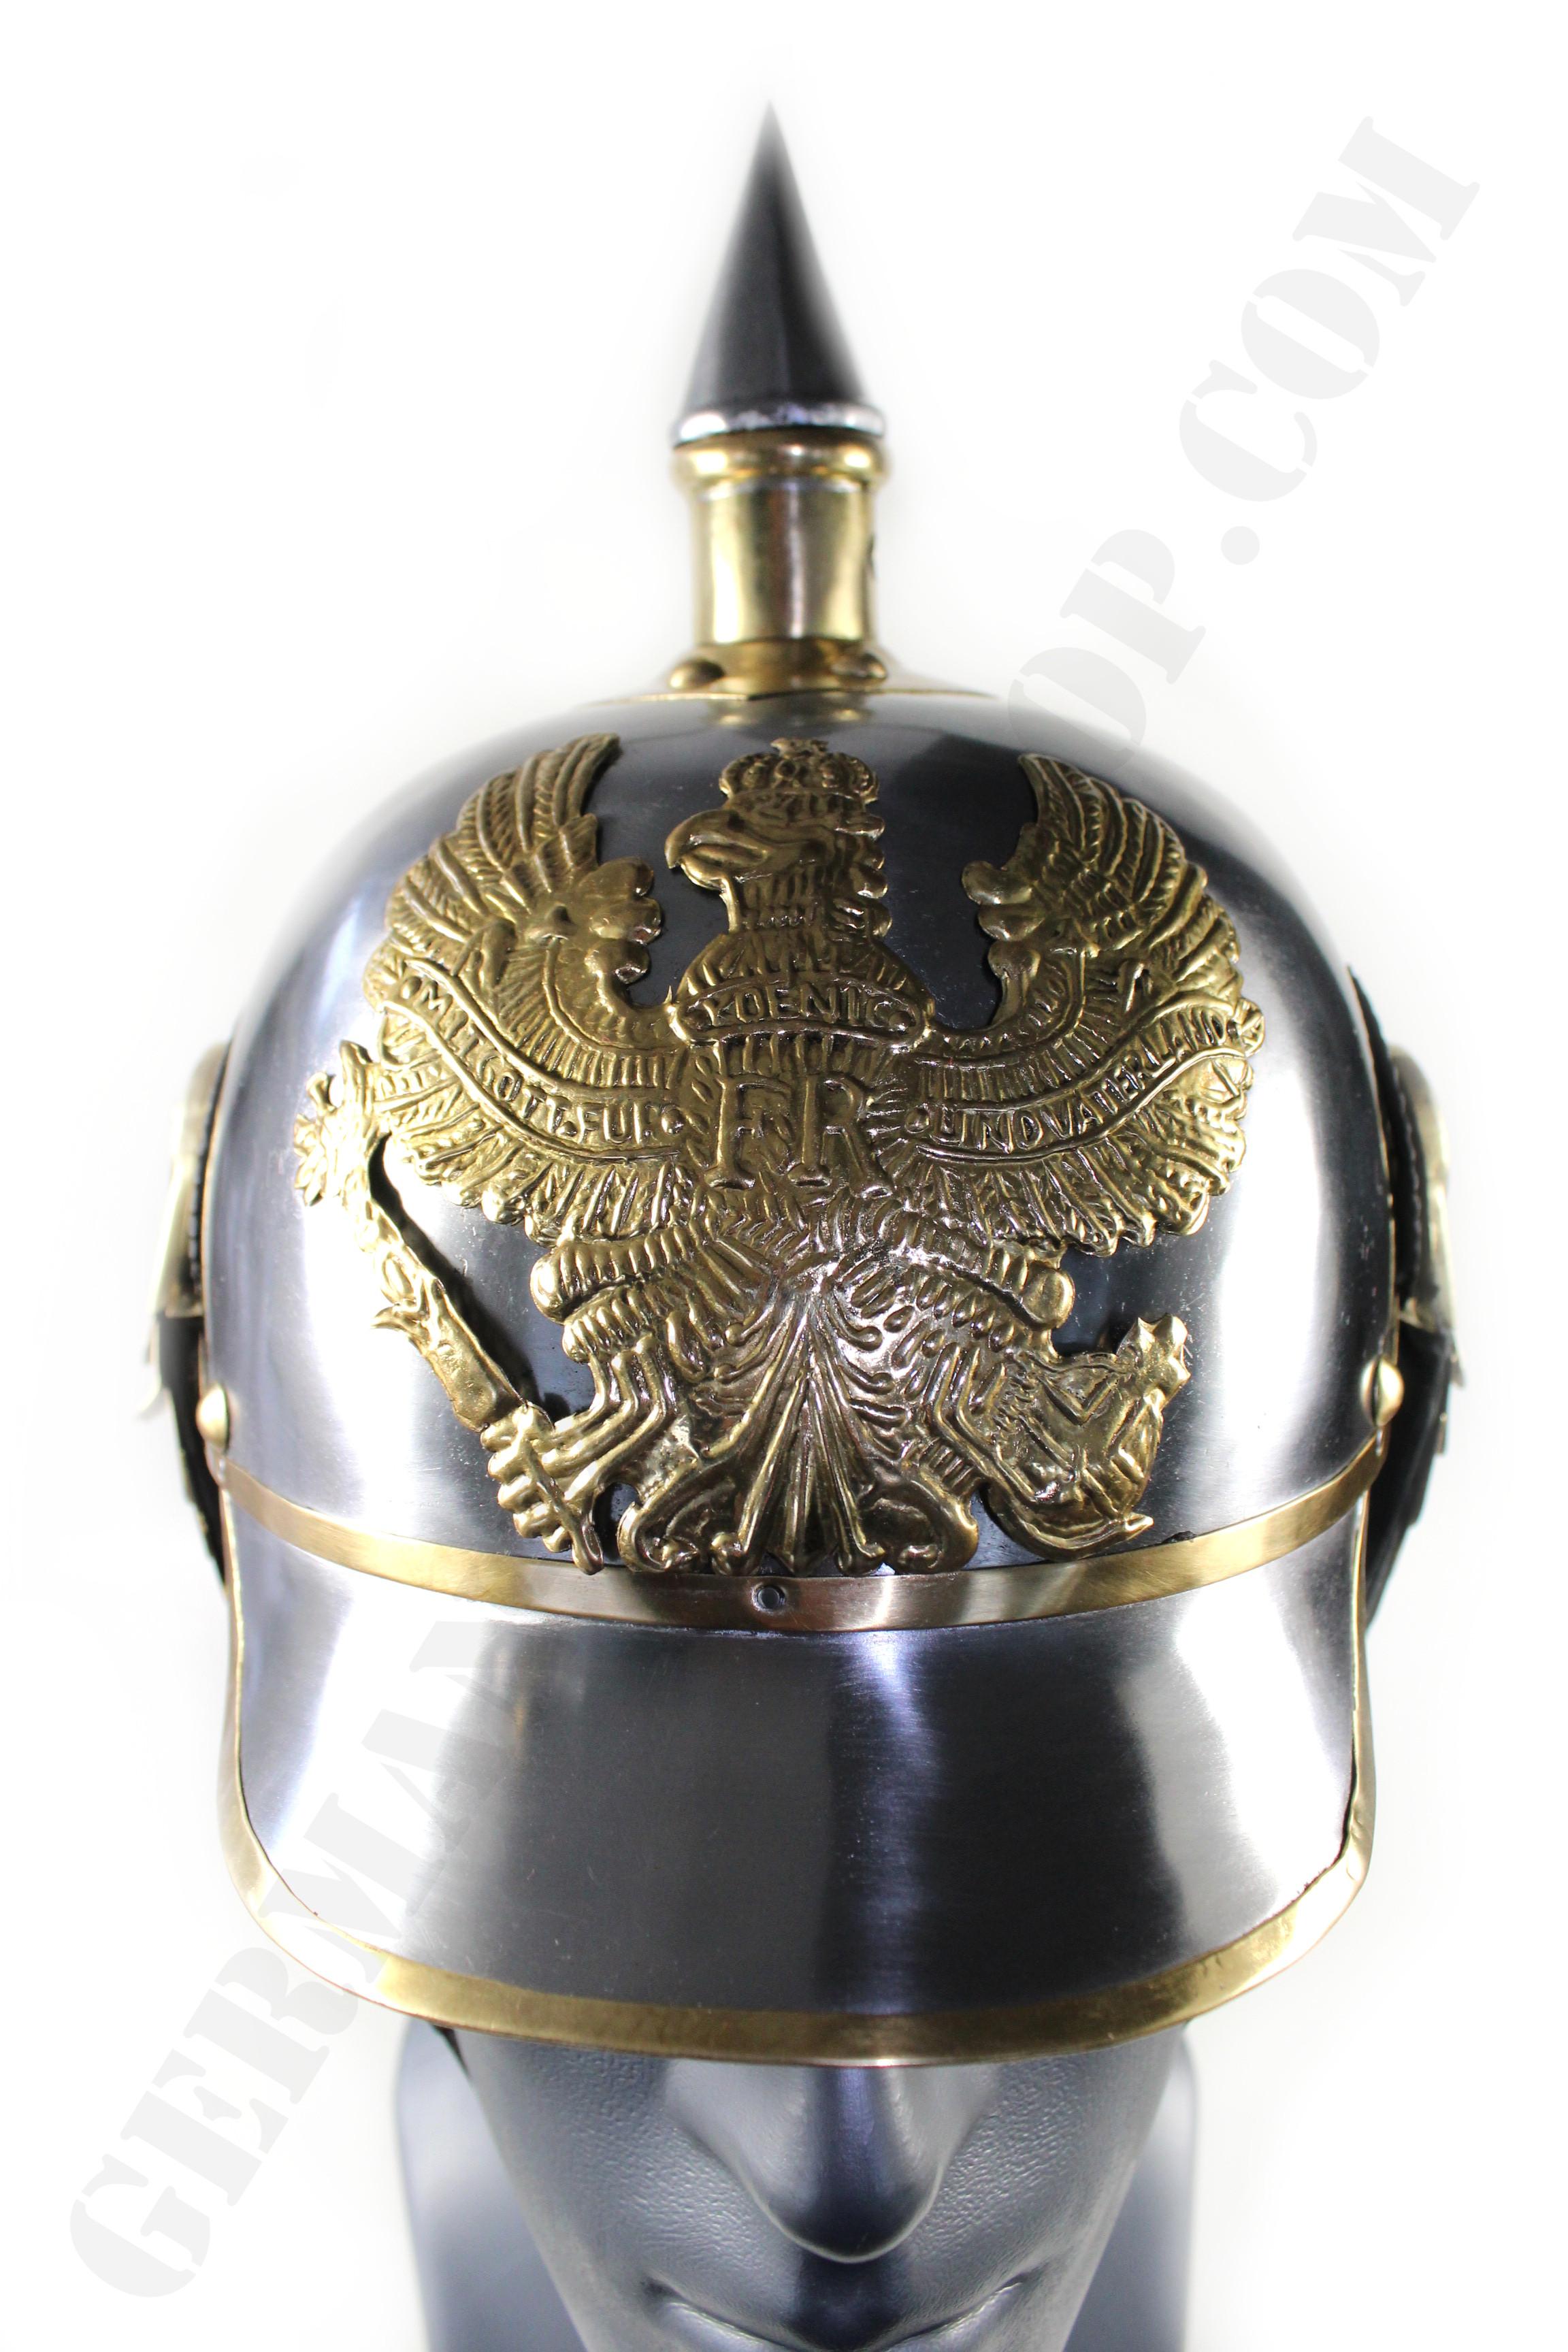 Prussian Kurassier Pickelhaube Spiked Lobster Tail Helmet